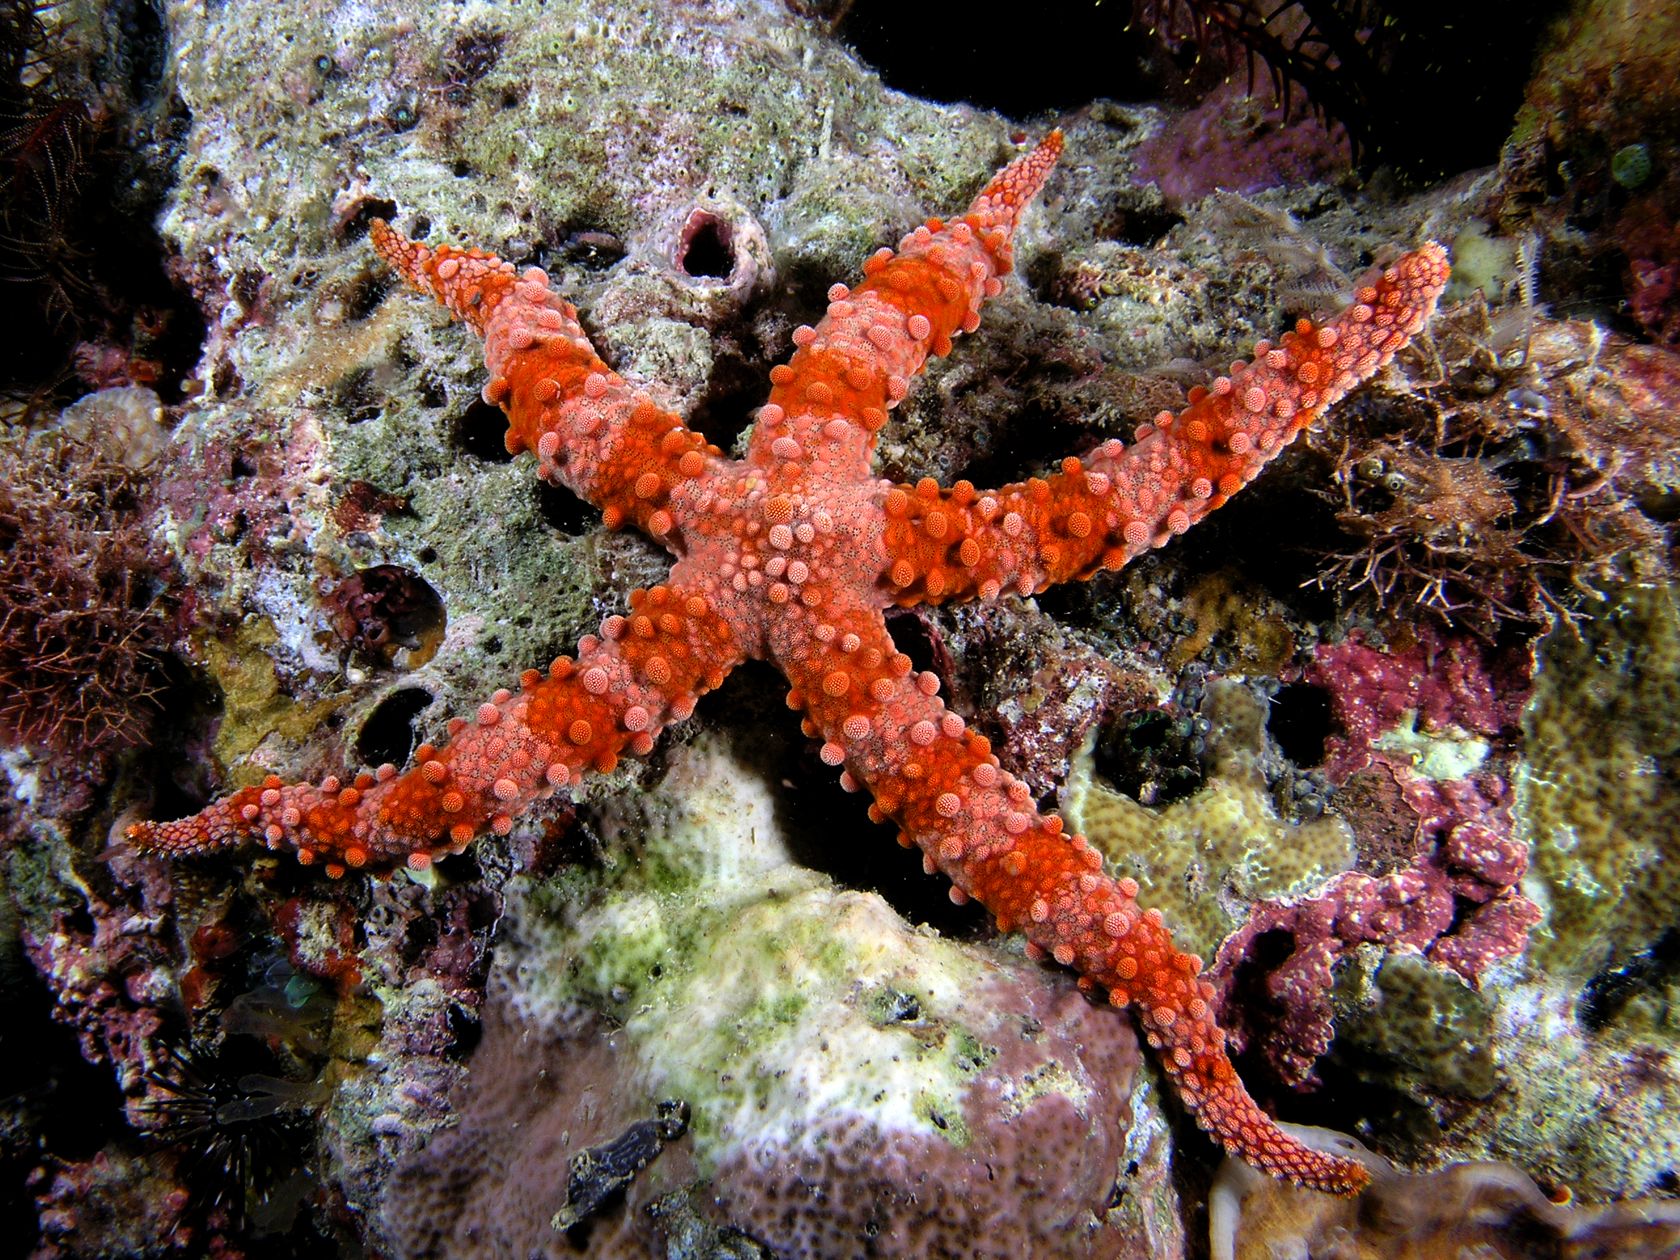 Starfish red komodo by Nick Hobgood via Wikipedia